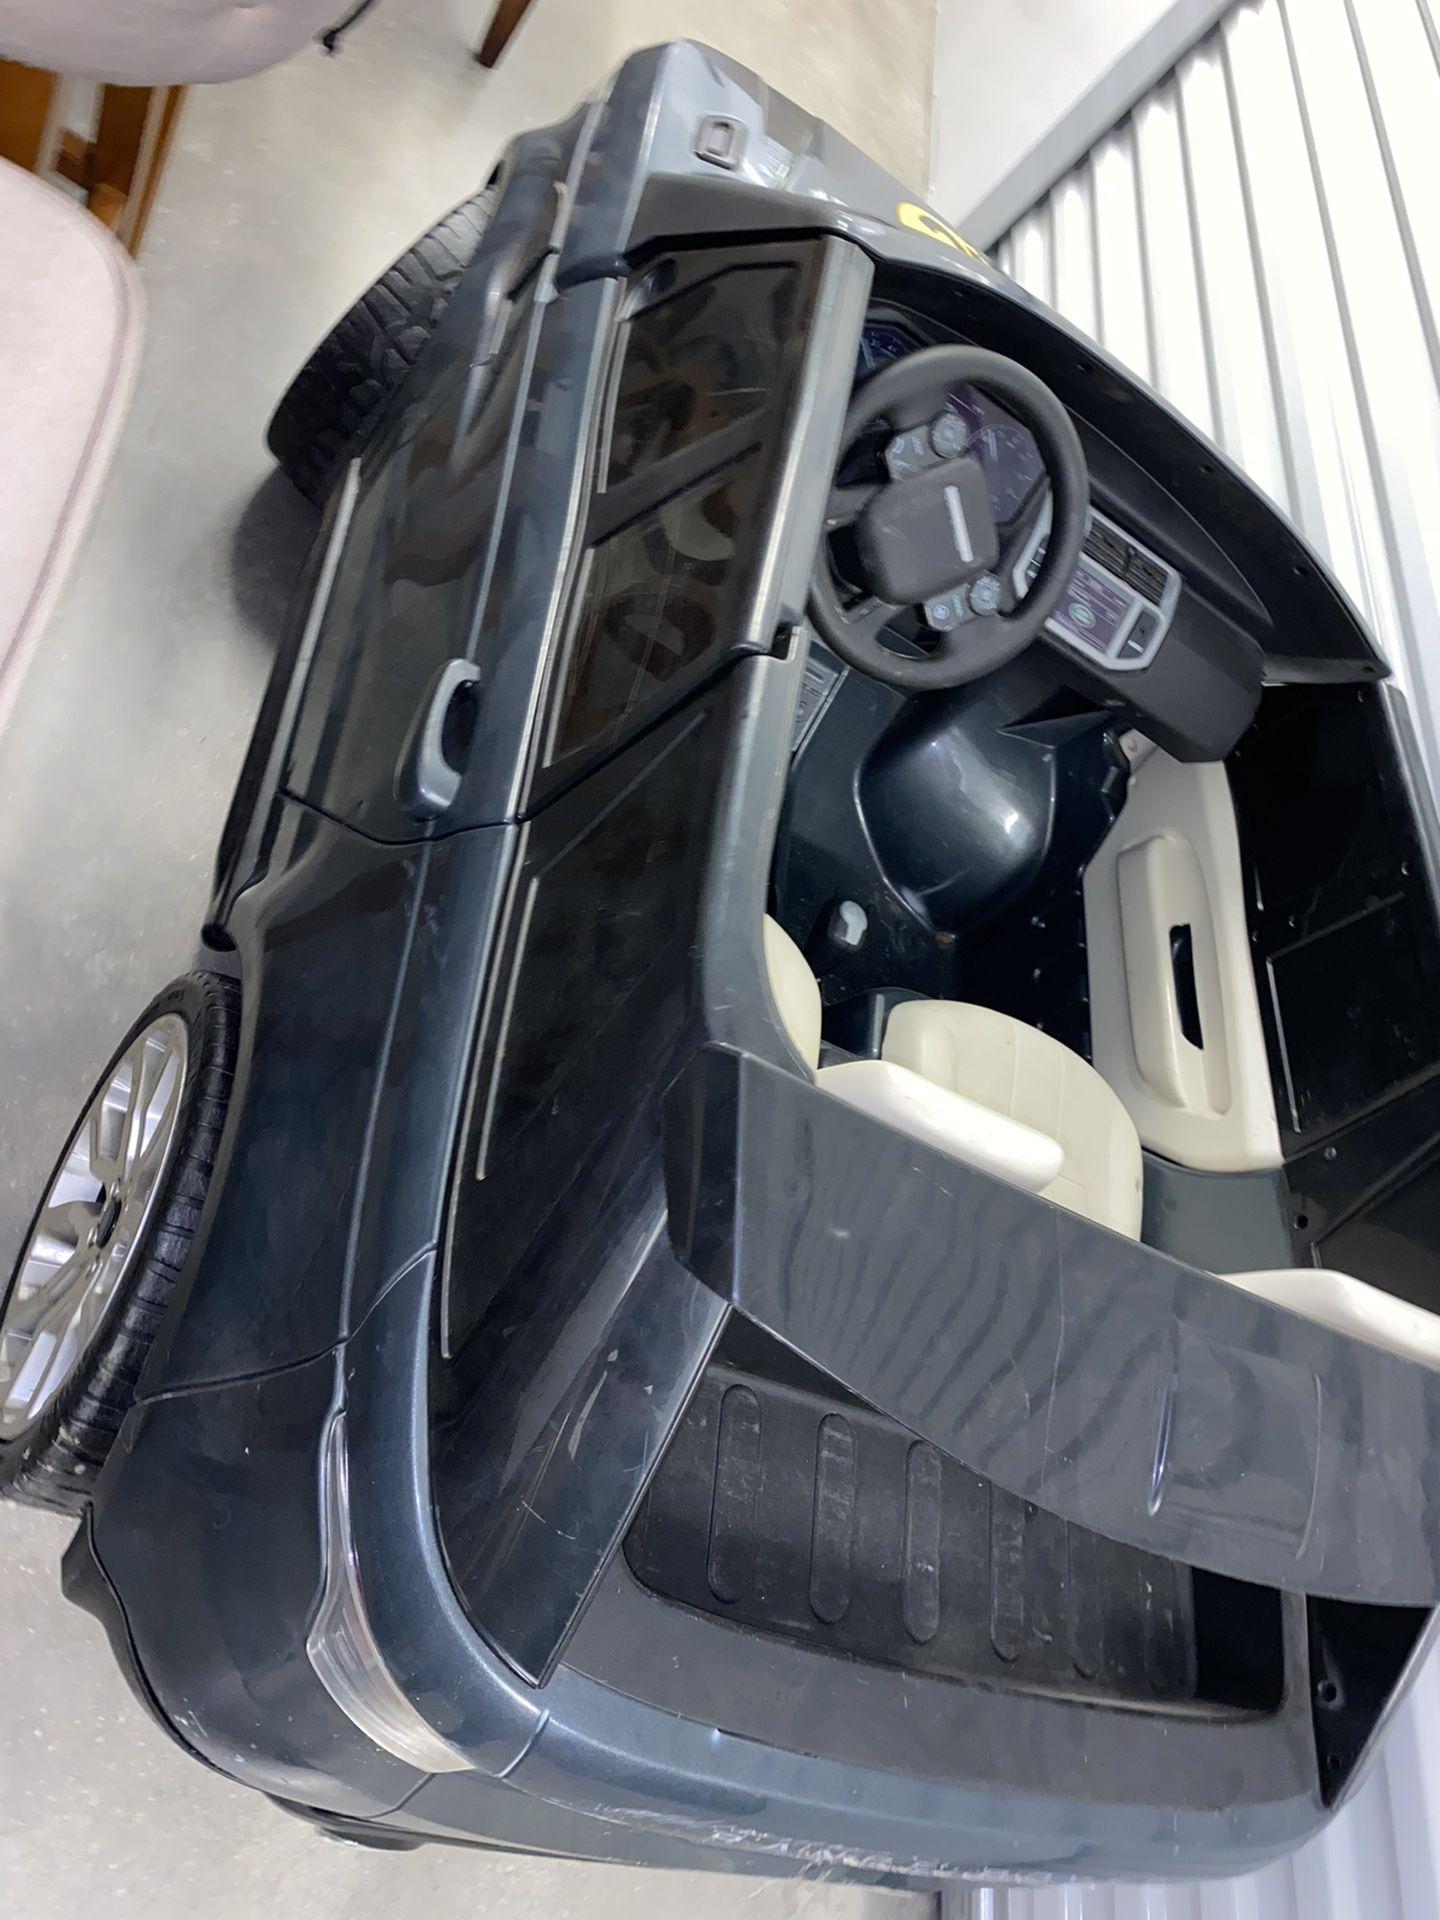 Battery Powered Range Rover